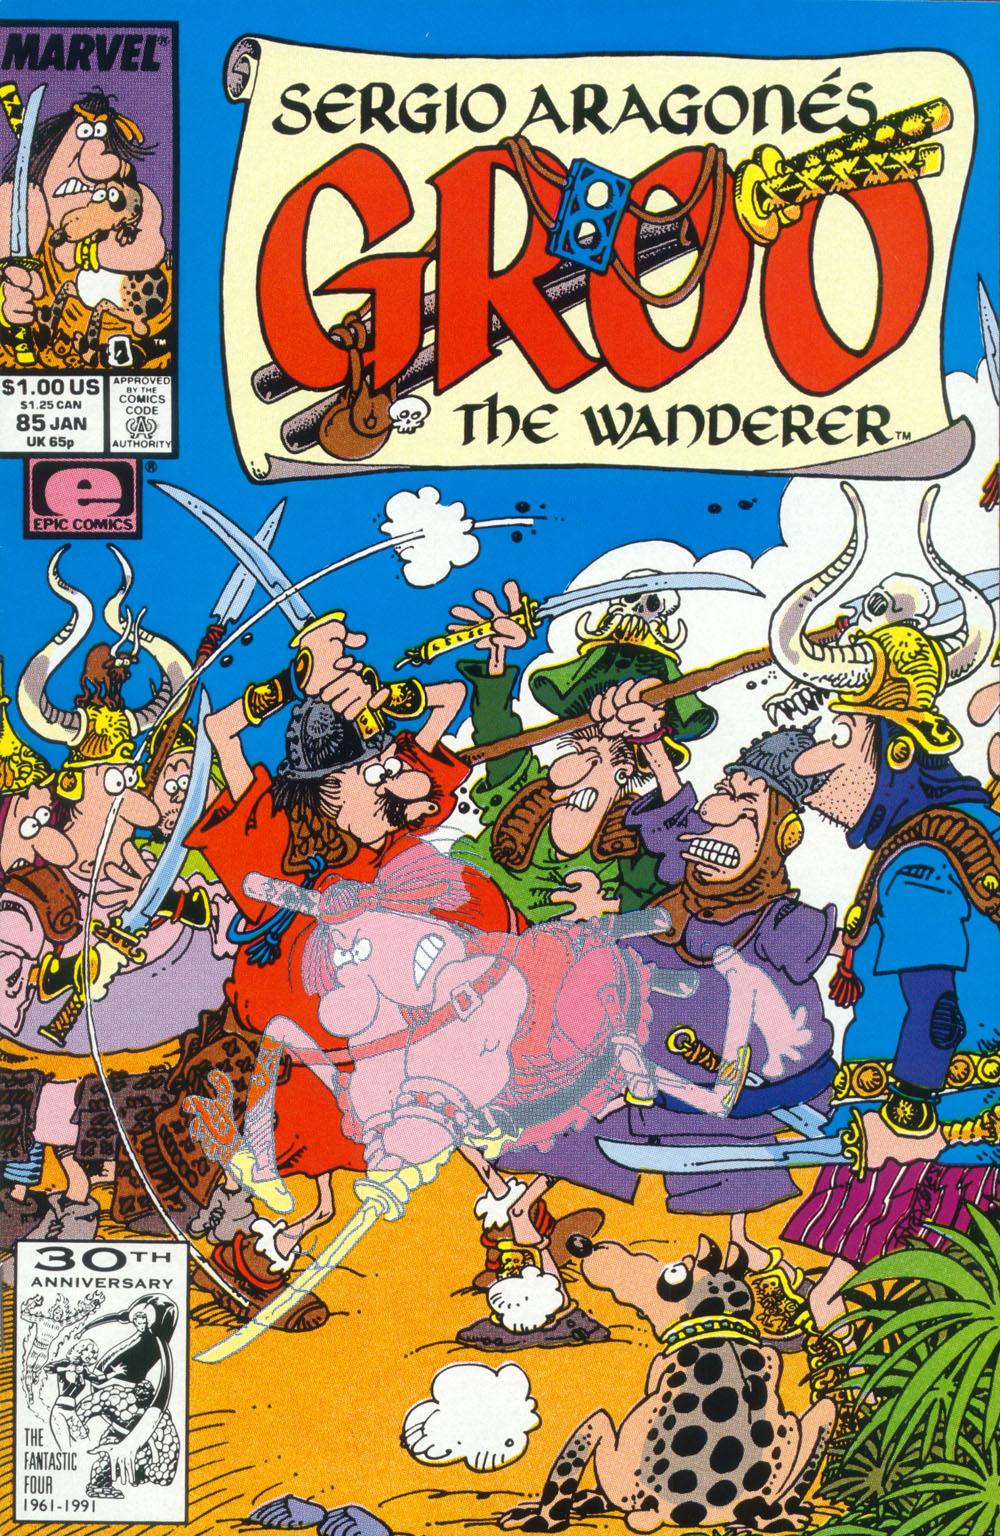 Read online Sergio Aragonés Groo the Wanderer comic -  Issue #85 - 1